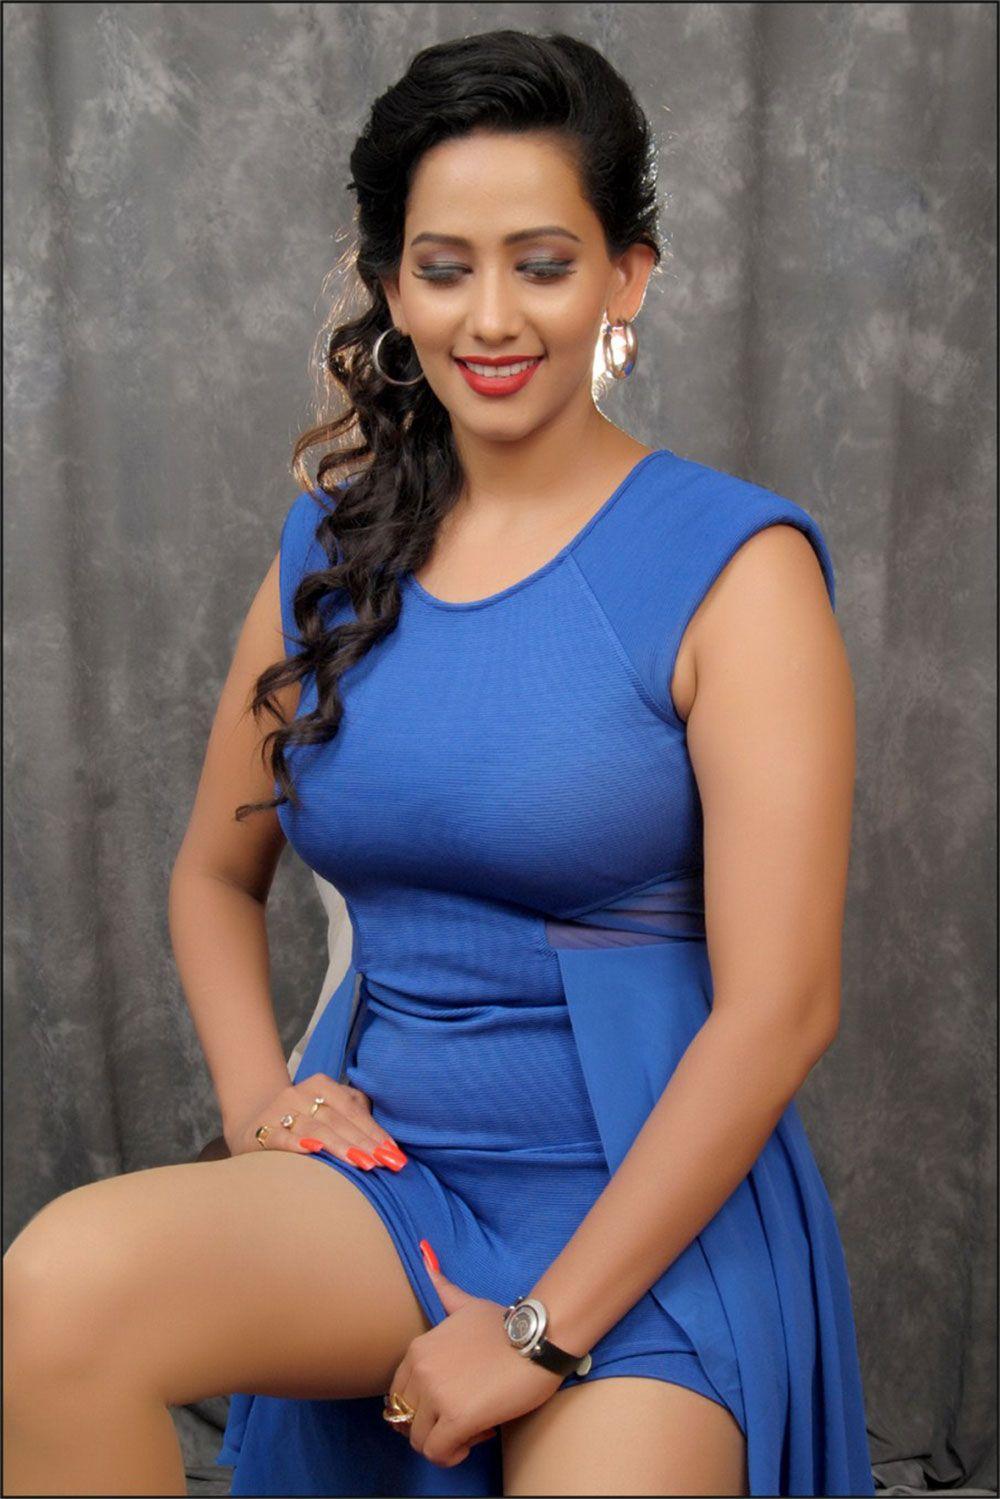 Sexy Film Hindi Mai Blue